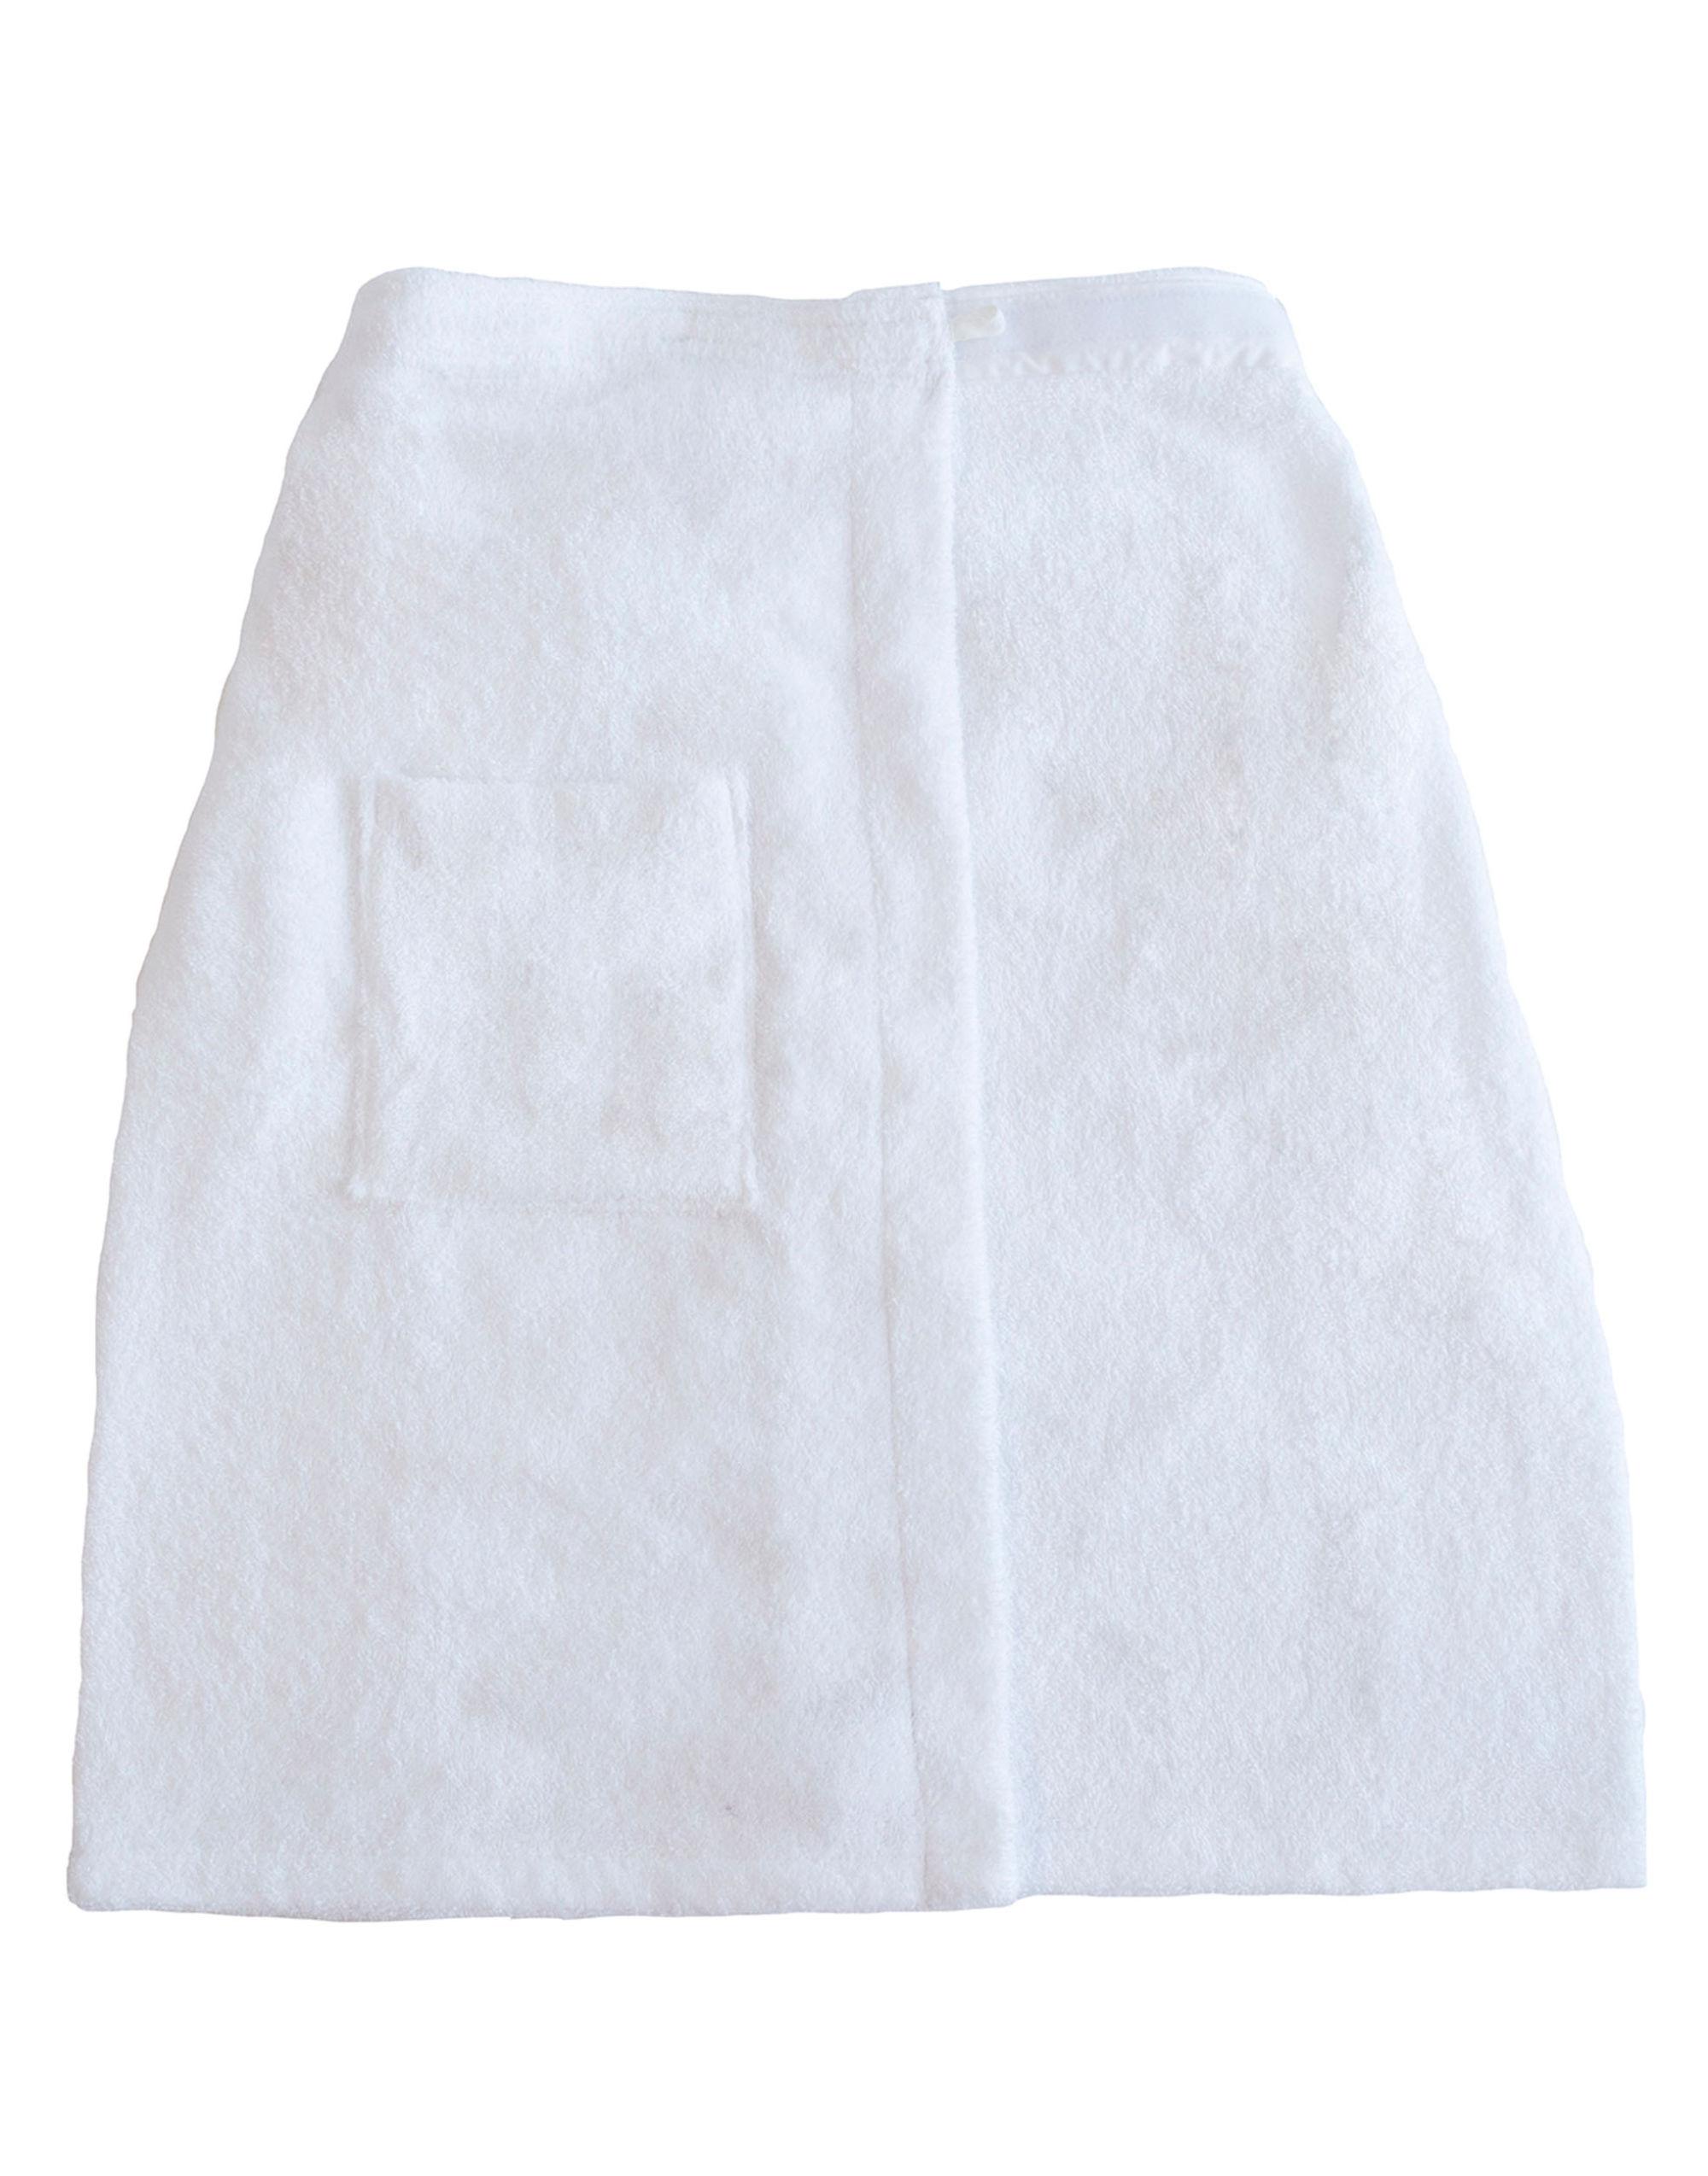 Jassz Towels Rhone Sauna Towel